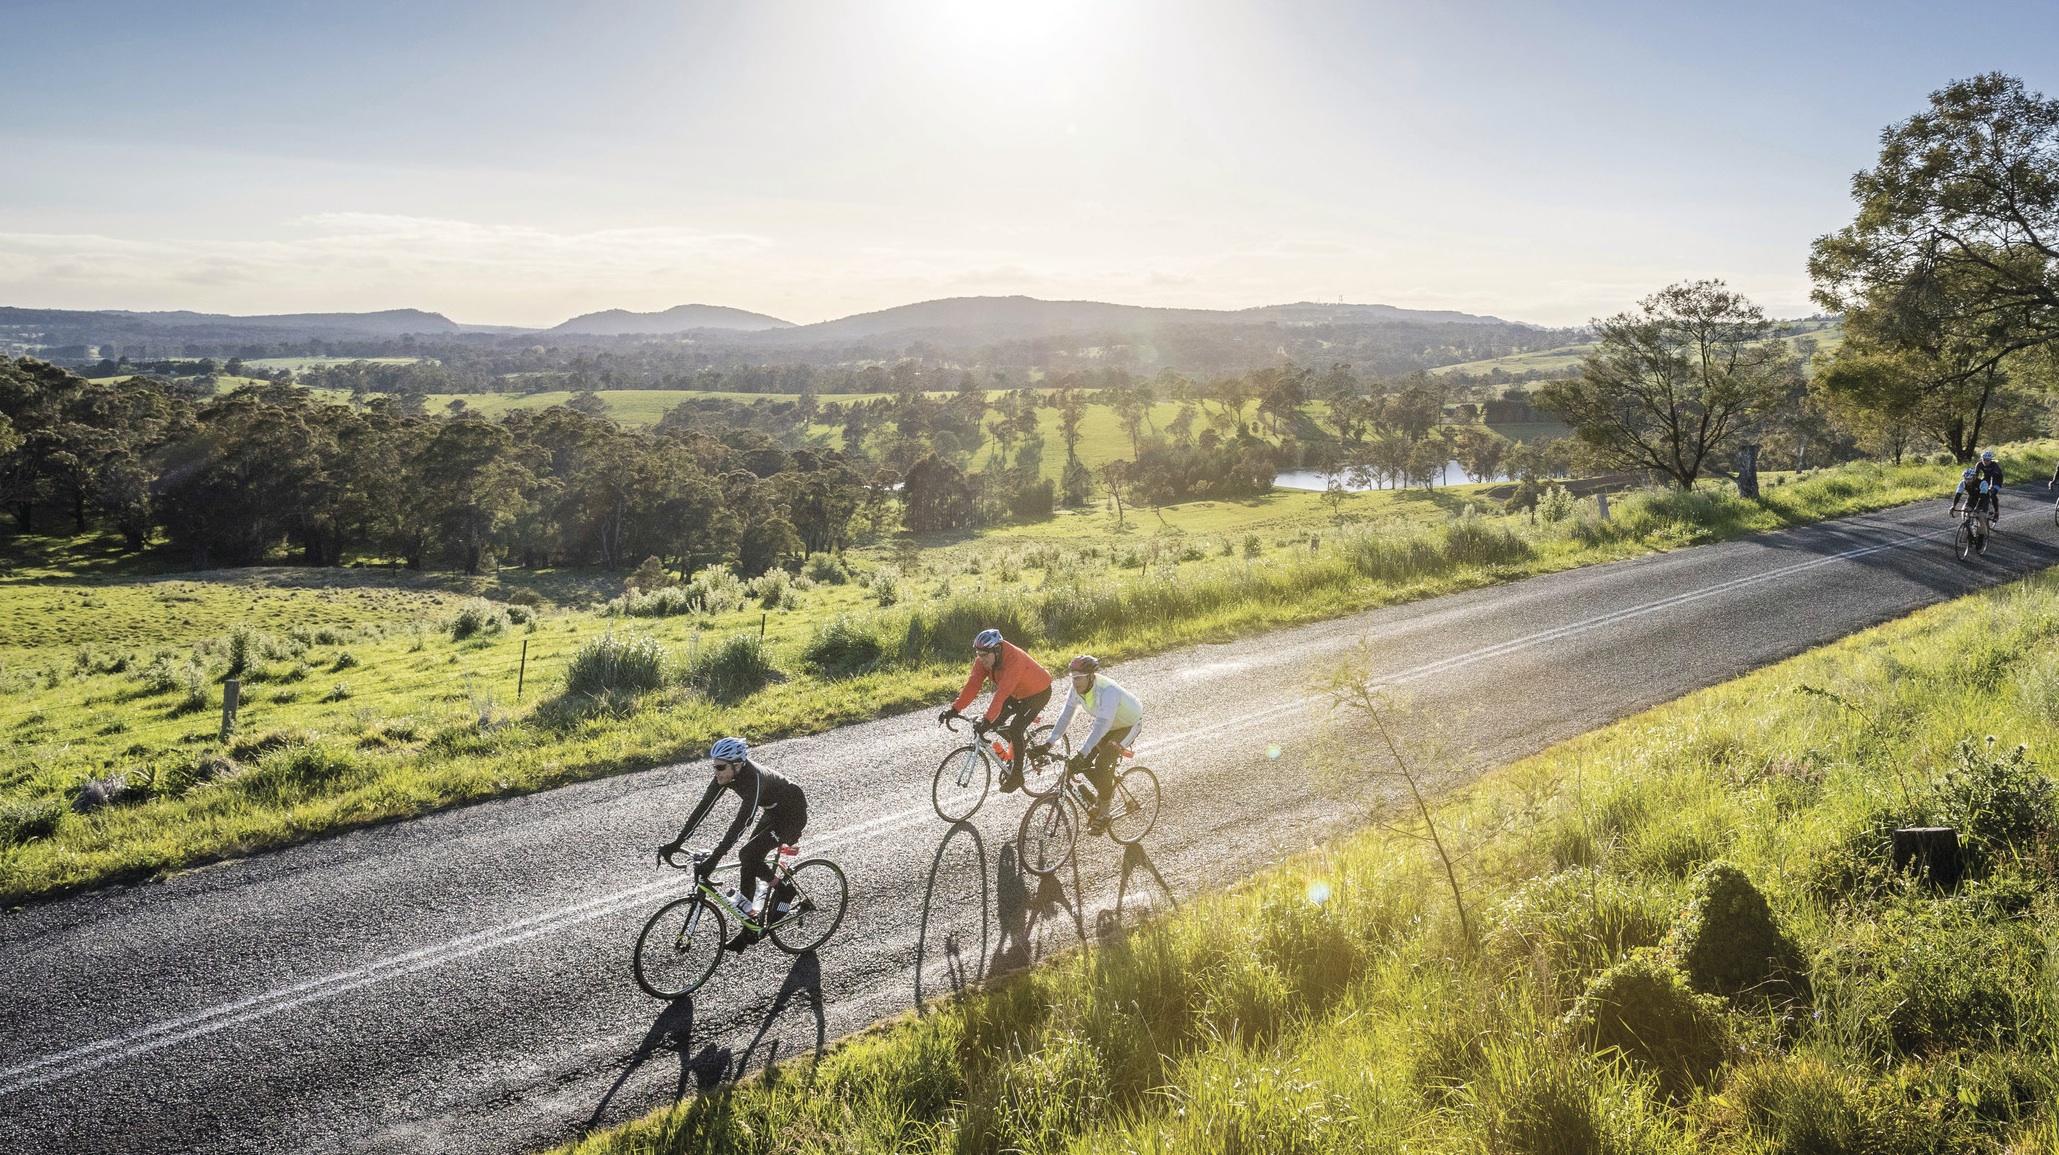 Photo: Southern Highlands, courtesy of Beardy McBeardy and  Destination NSW